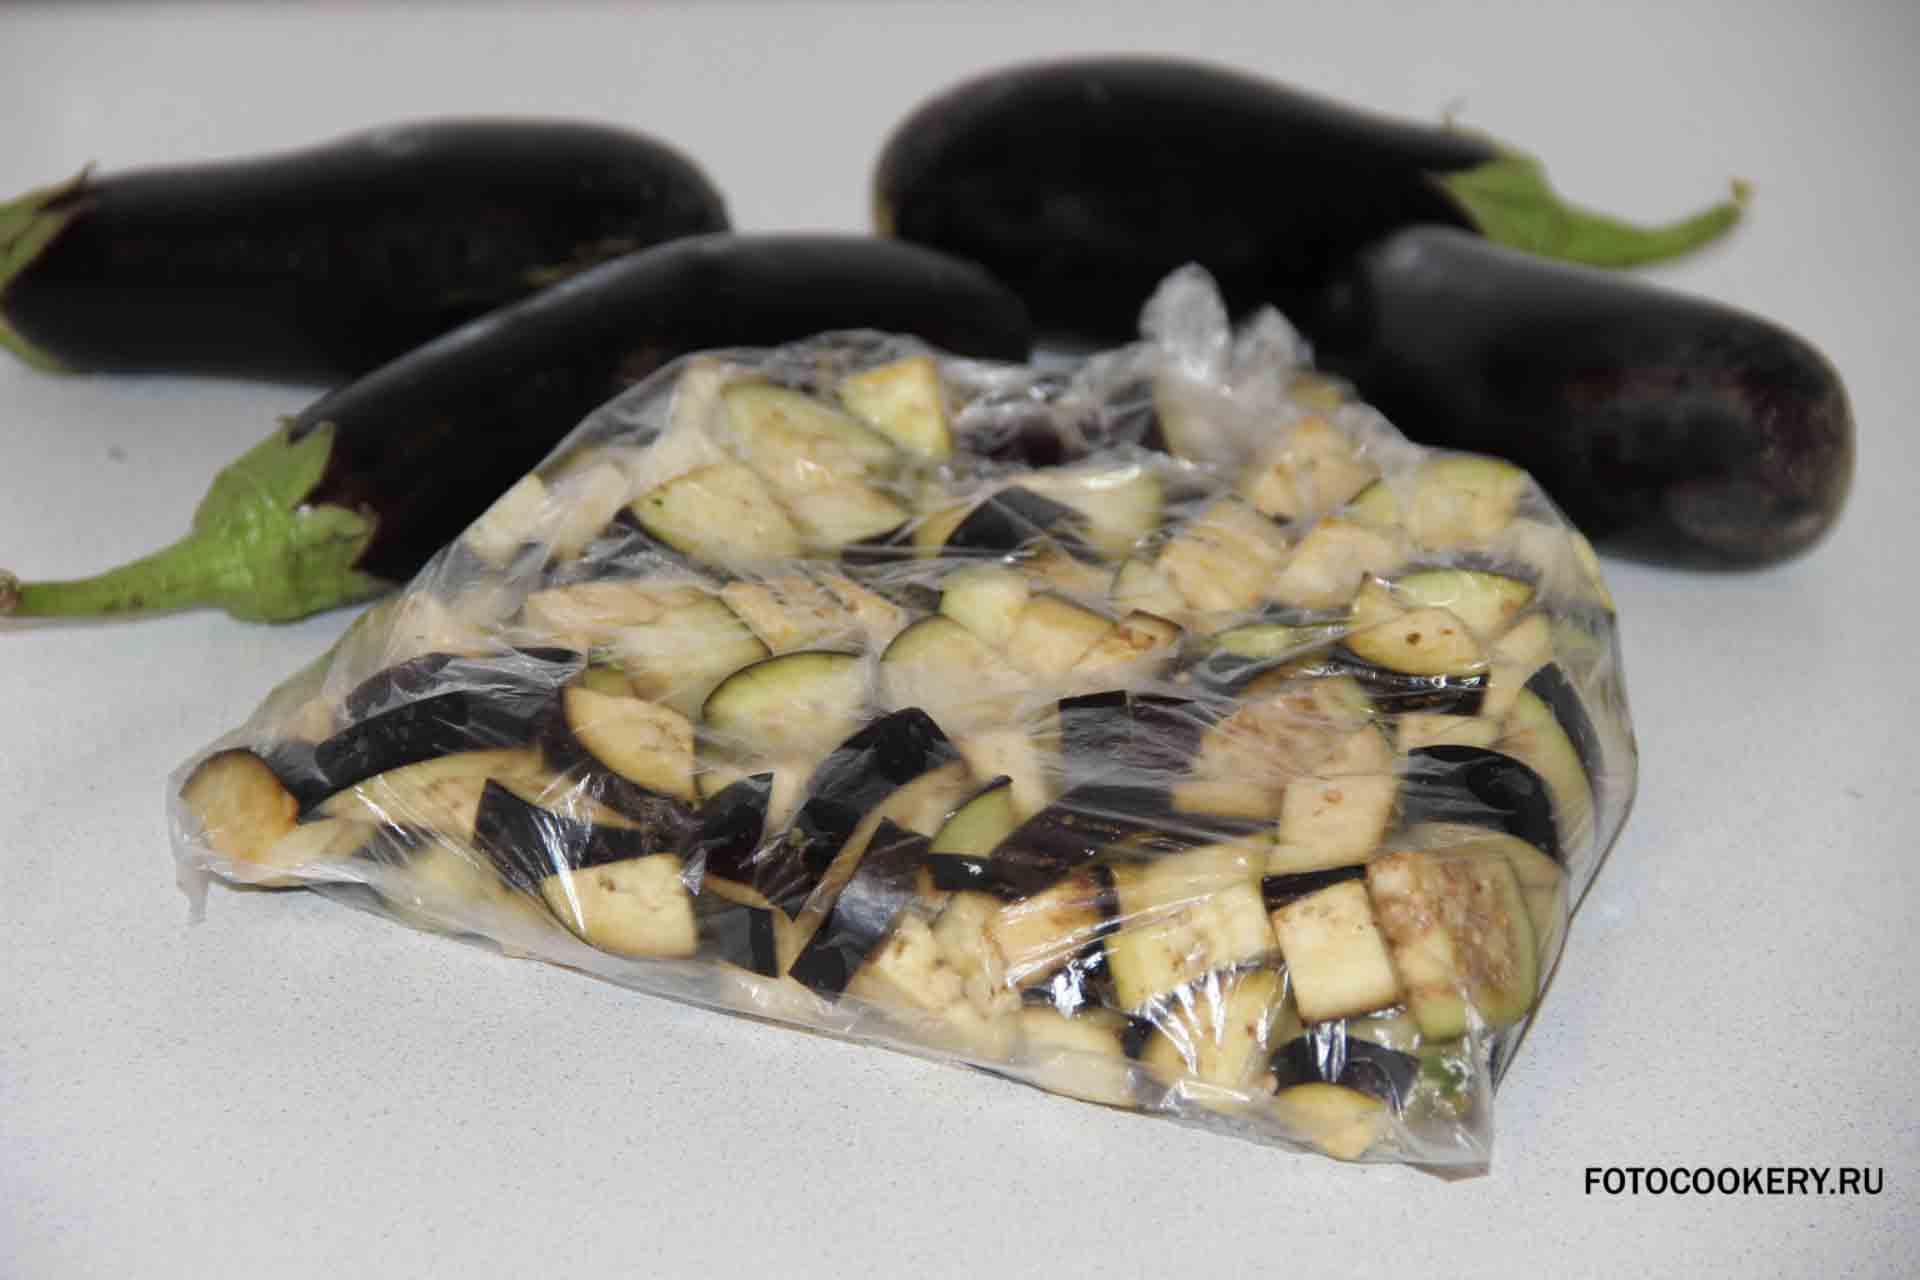 Как заморозить баклажаны на зиму свежими в домашних условиях фото